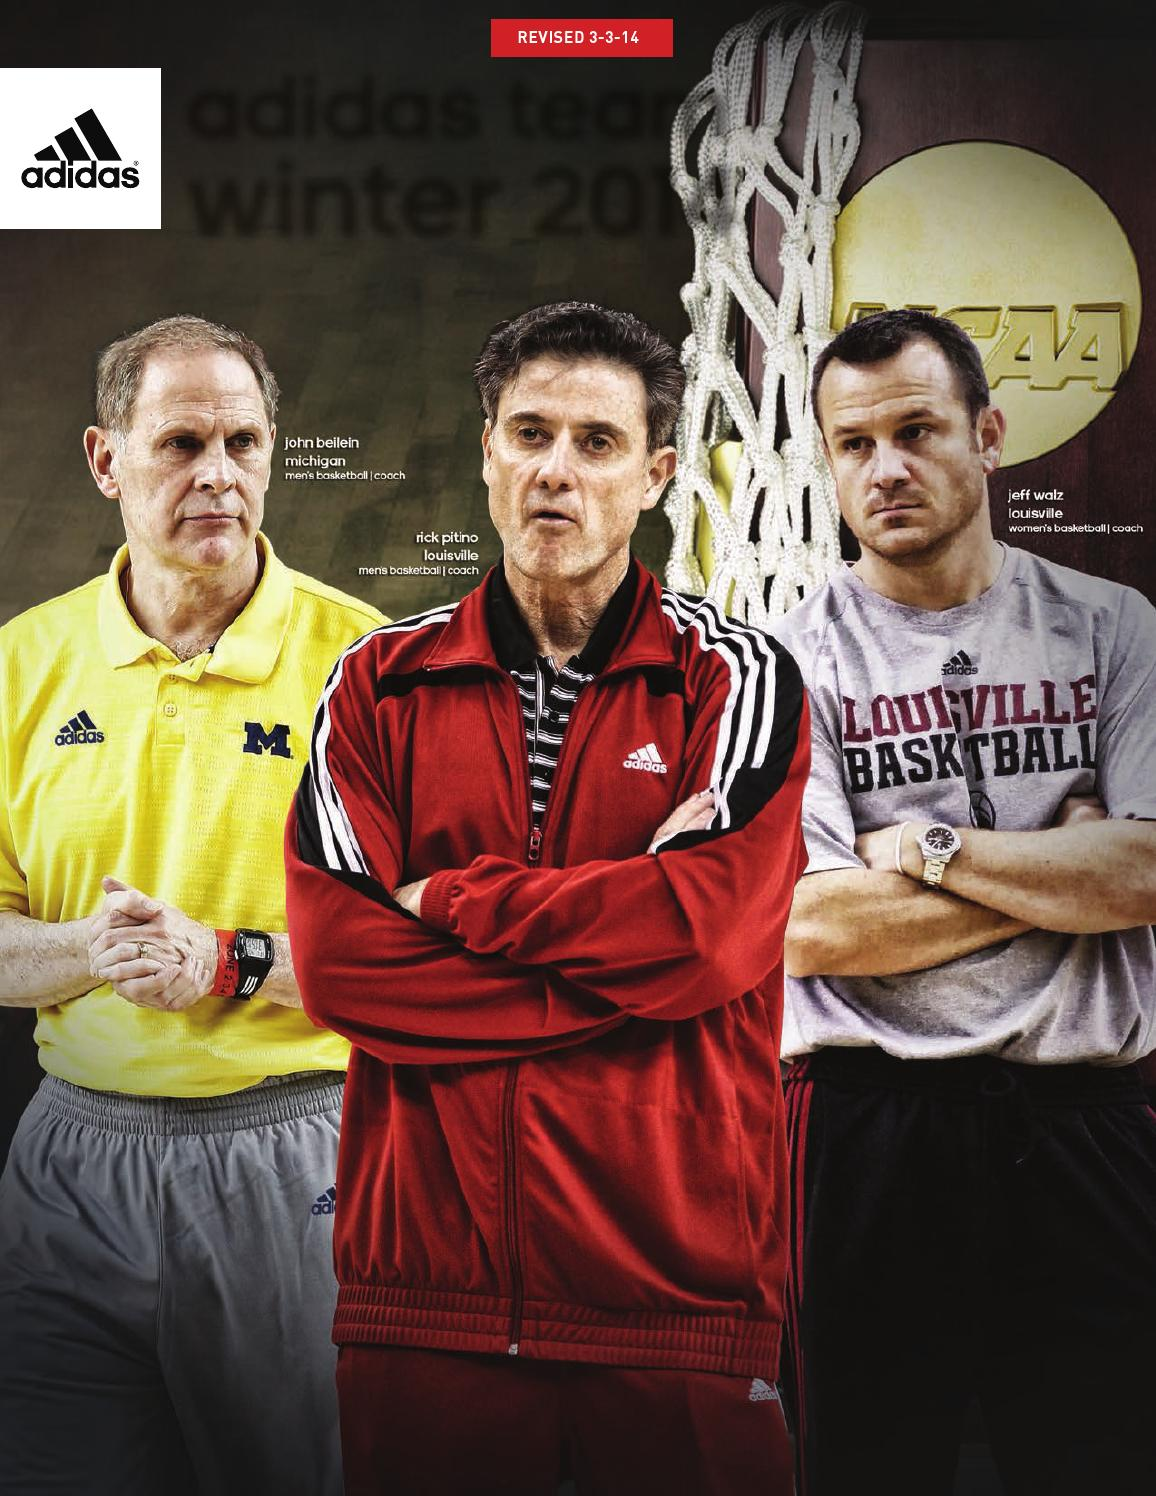 buy online 5e06d 7786c Kollege Town Sports - 2014 Adidas Winter Catalog by Kollegetown - issuu